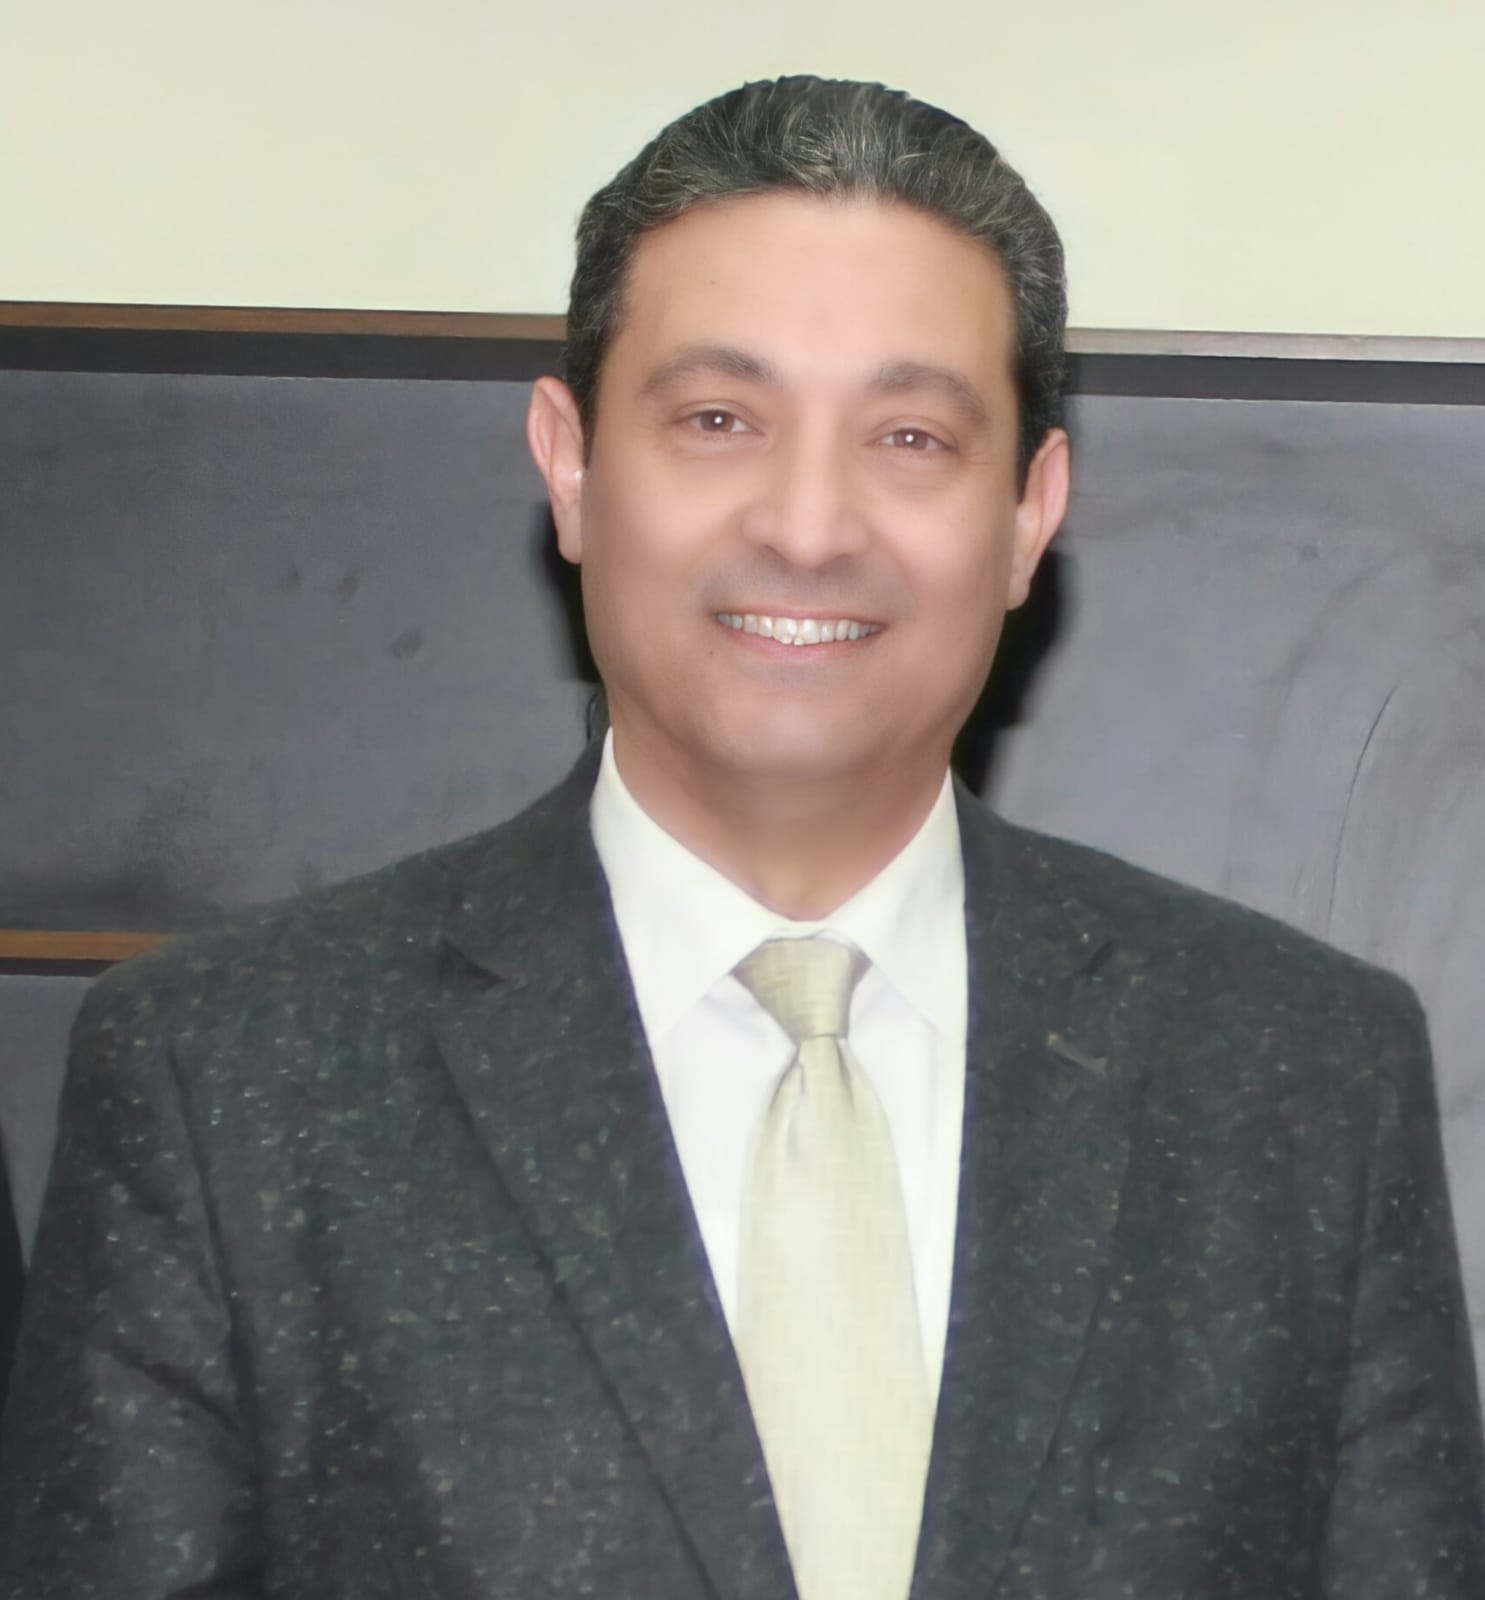 Ayman Mohamed Rashad Elshehaby